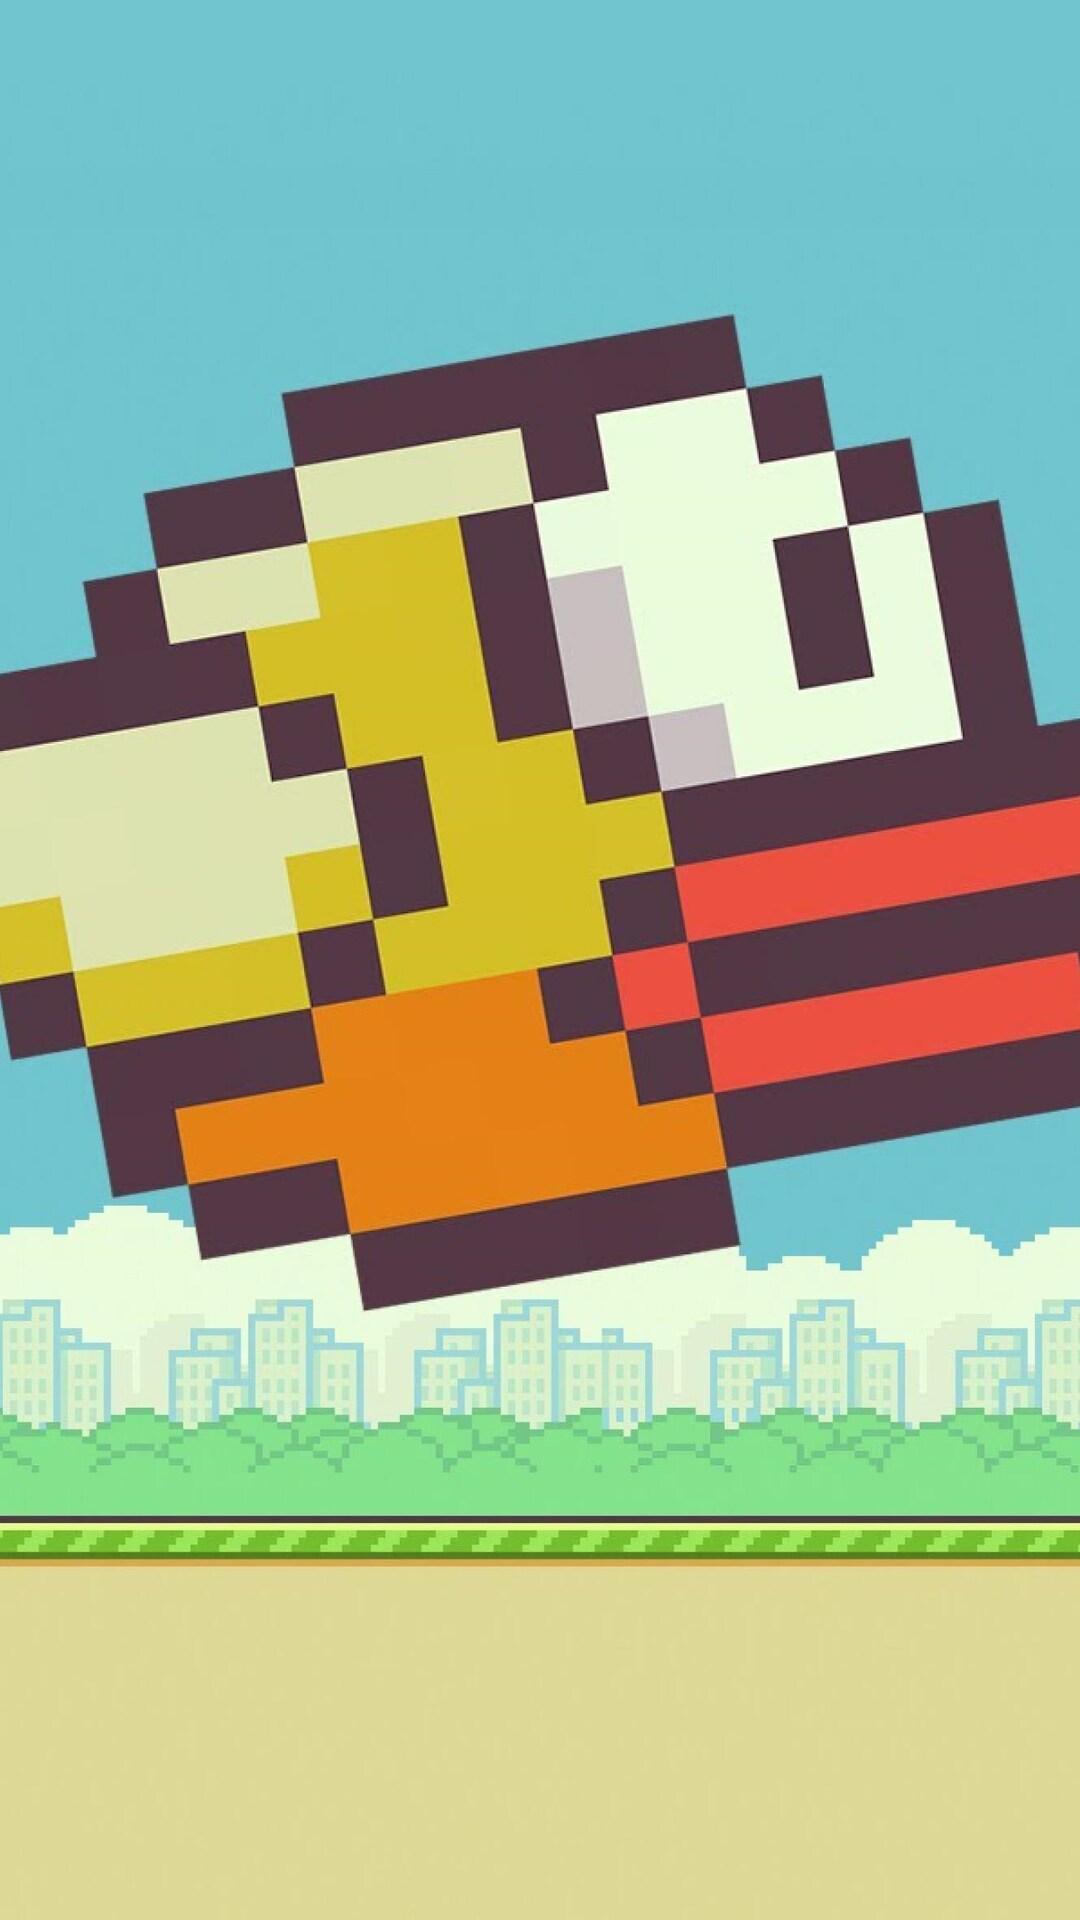 flappy-birds-hd.jpg